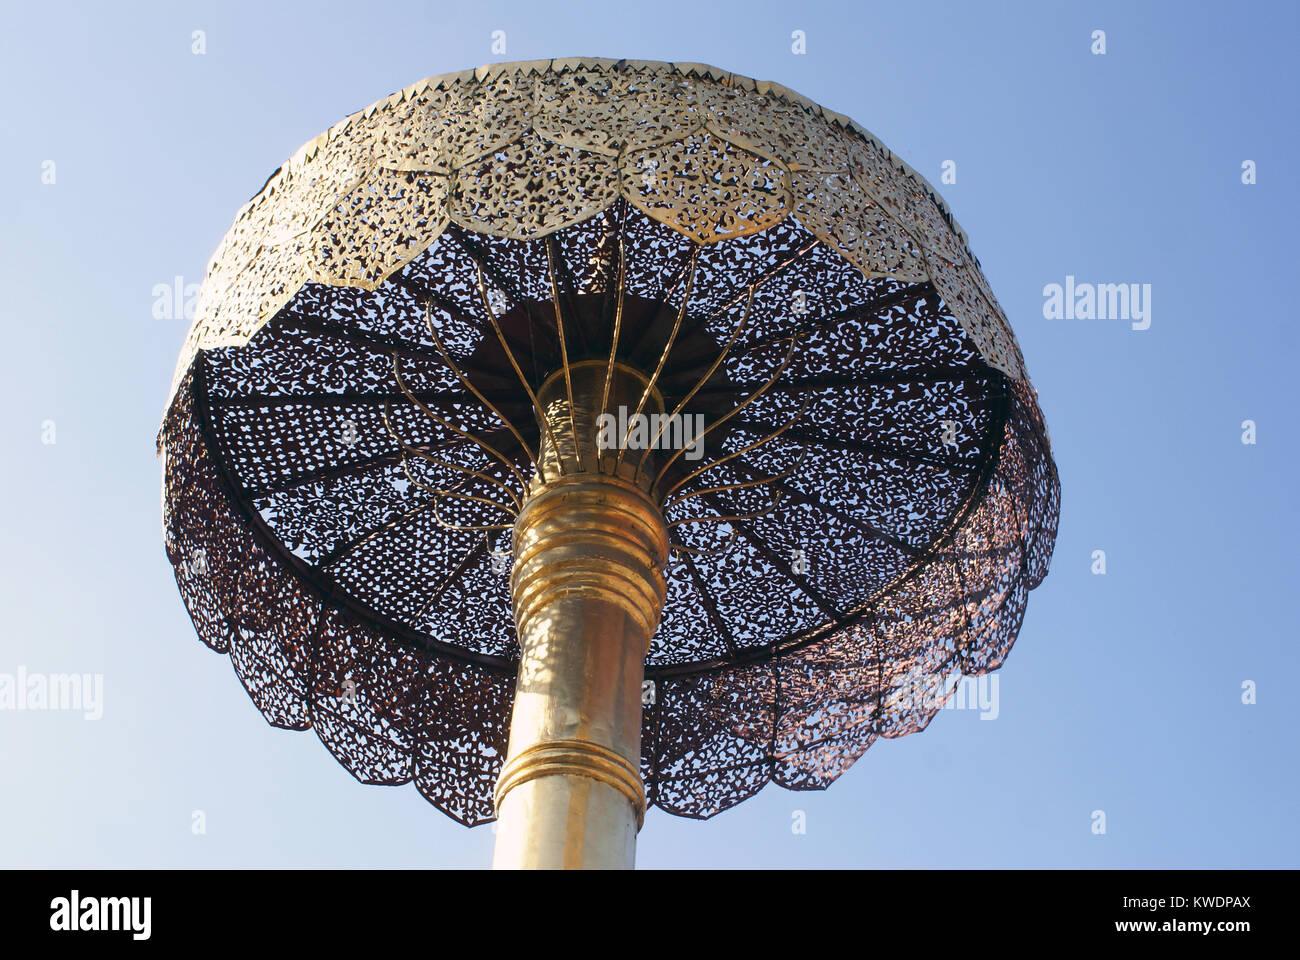 de6ef497e Very big umbrella in Wat Phra That Doi Sutep, Chiang Mai, thailand ...